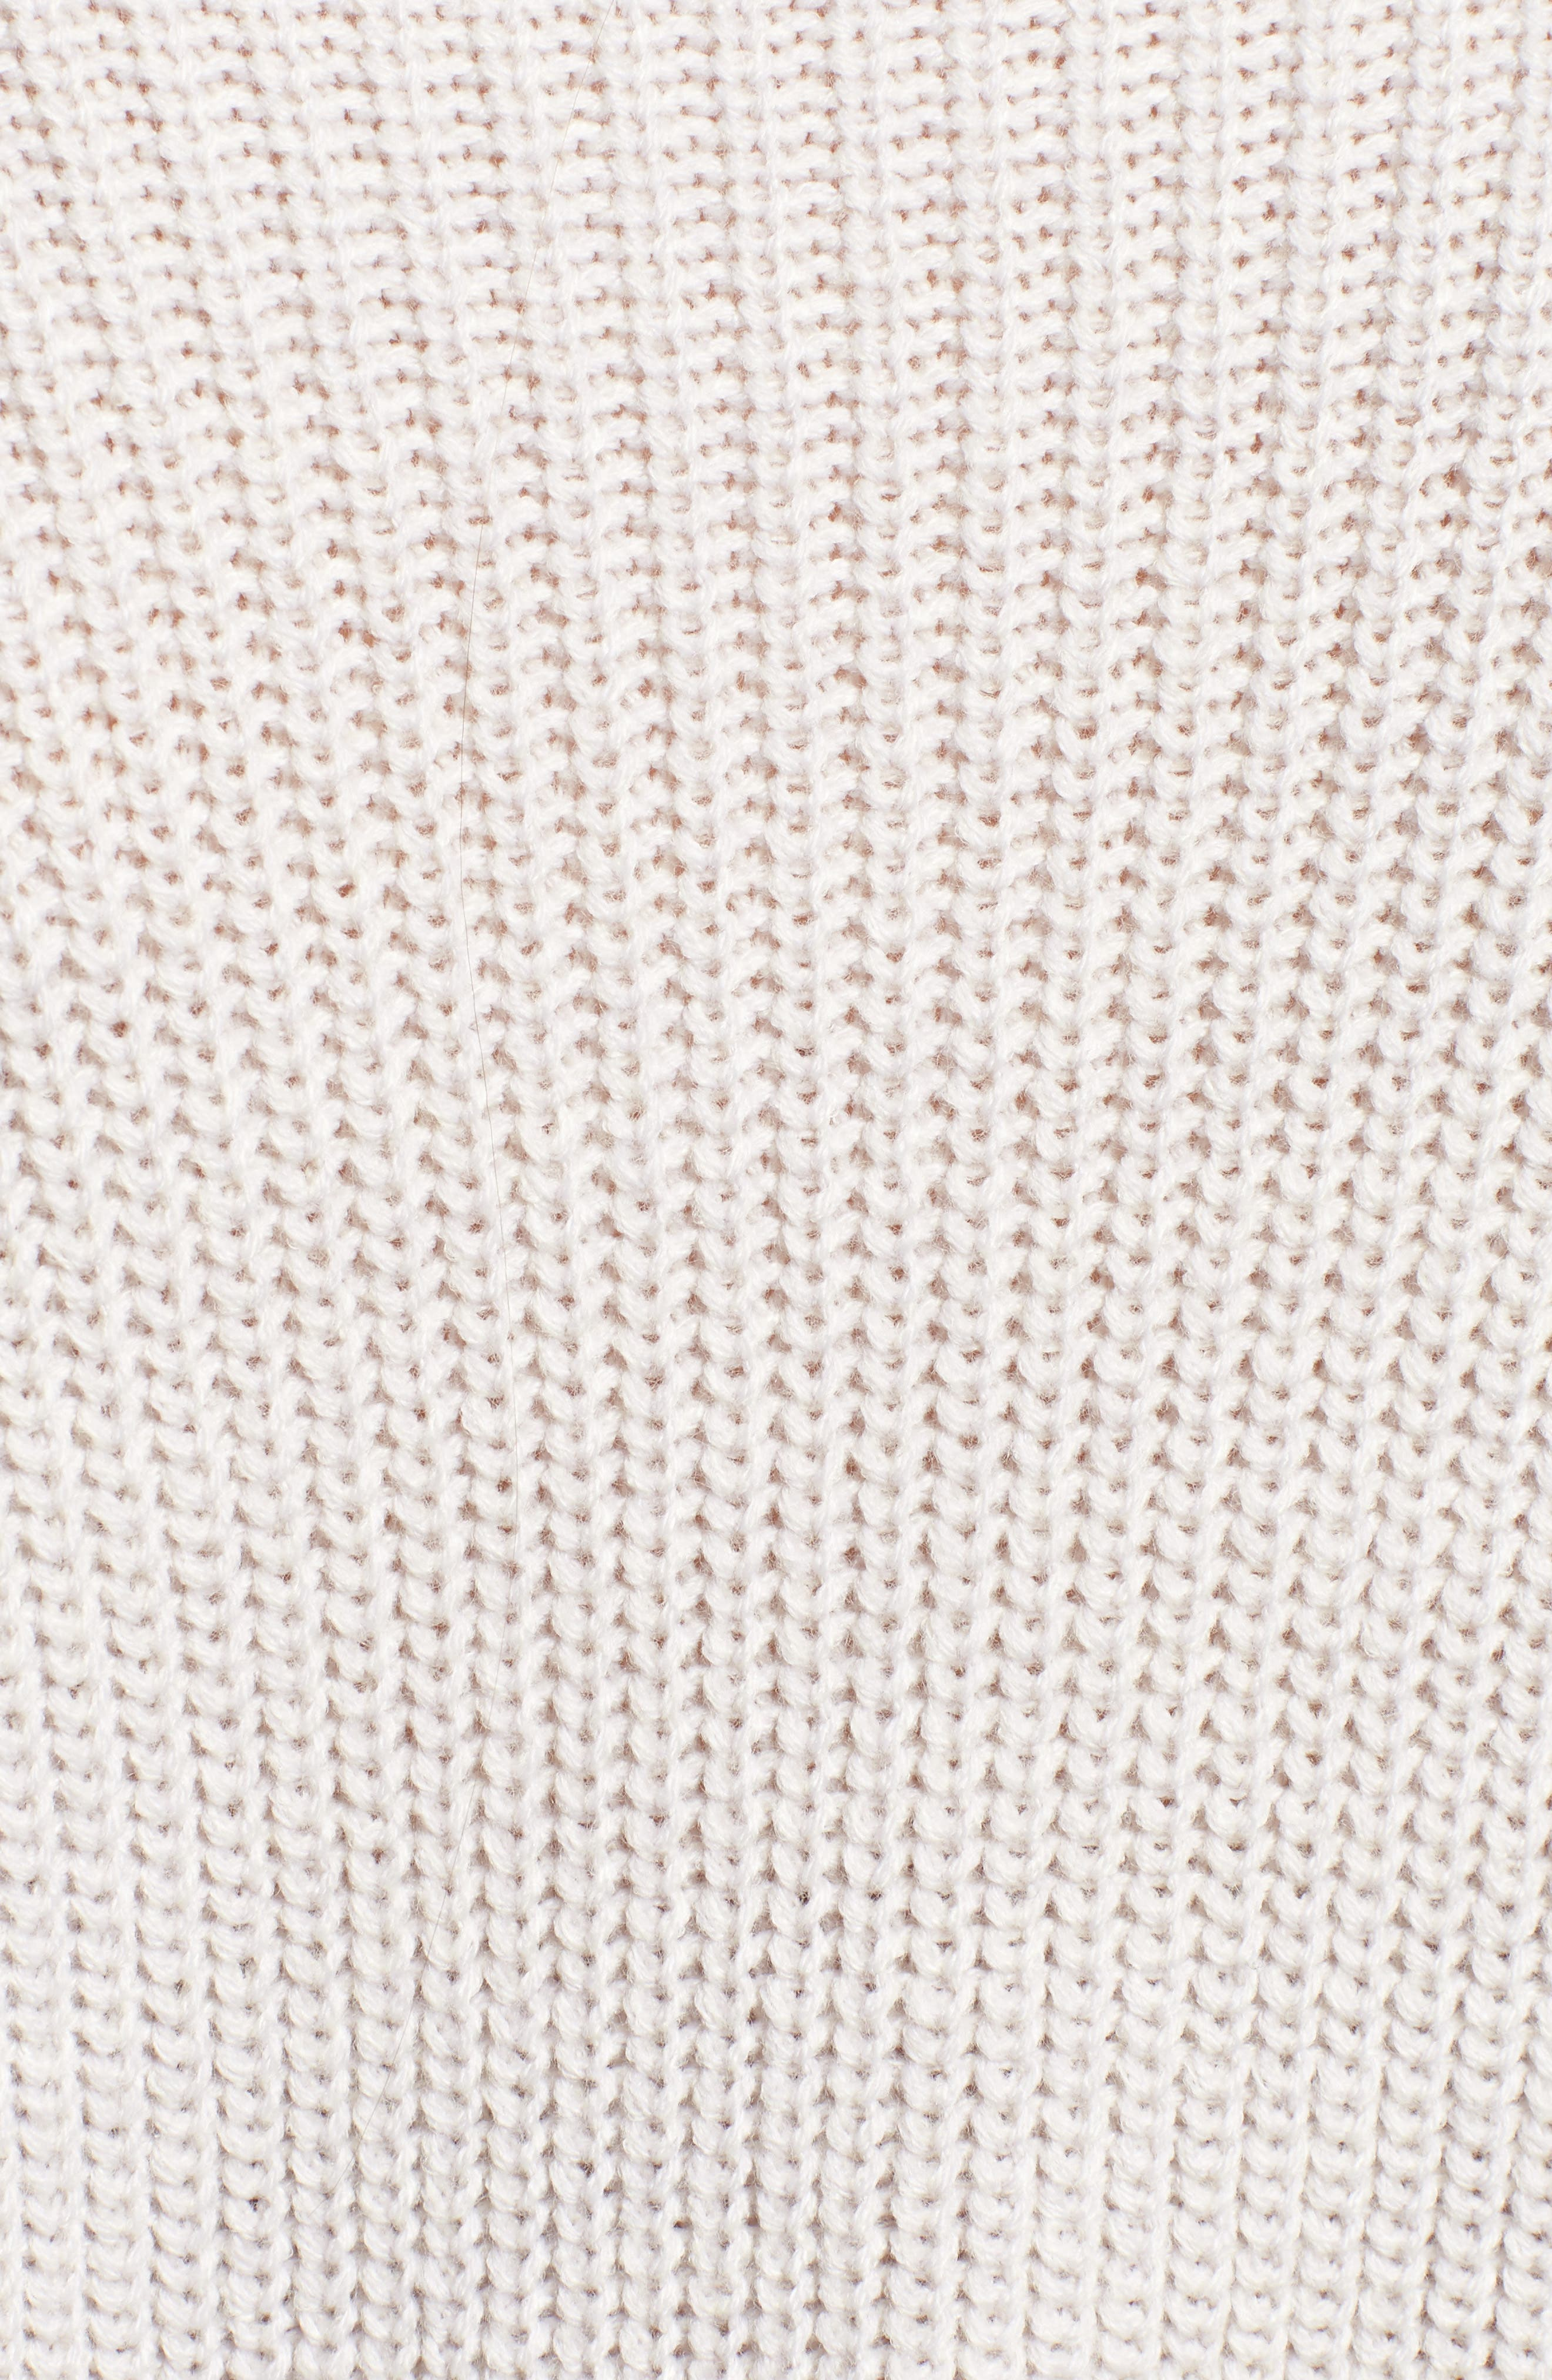 Grommet Sleeve Sweater,                             Alternate thumbnail 5, color,                             050